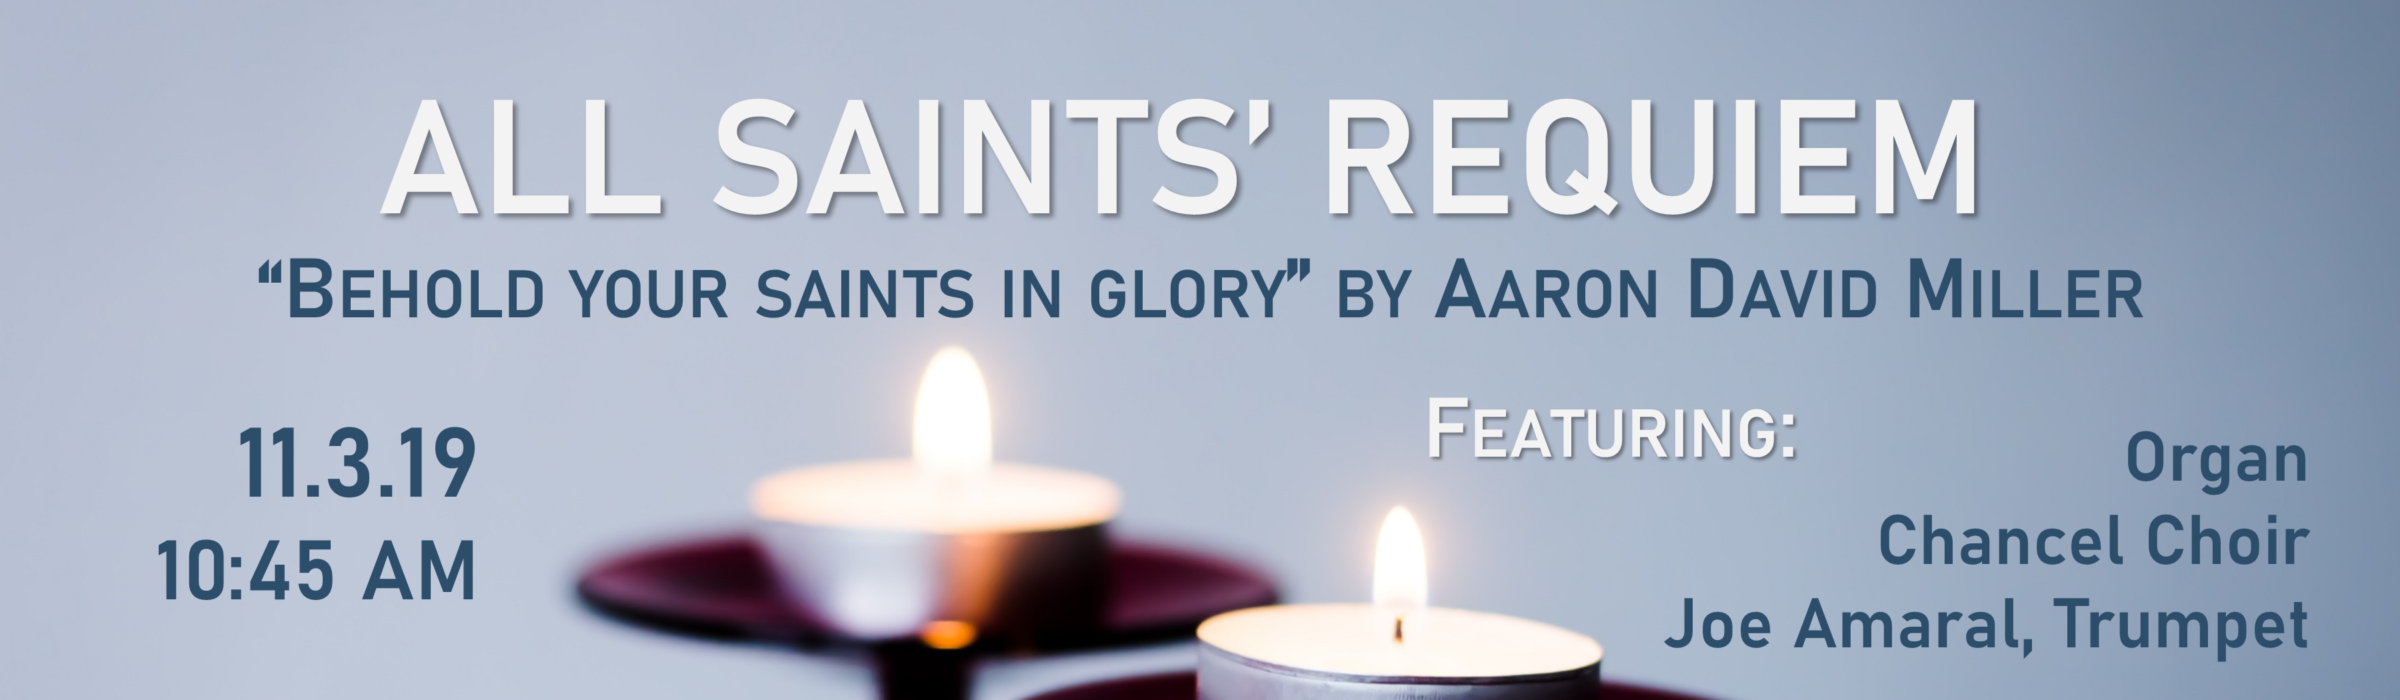 All Saints Banner 2019